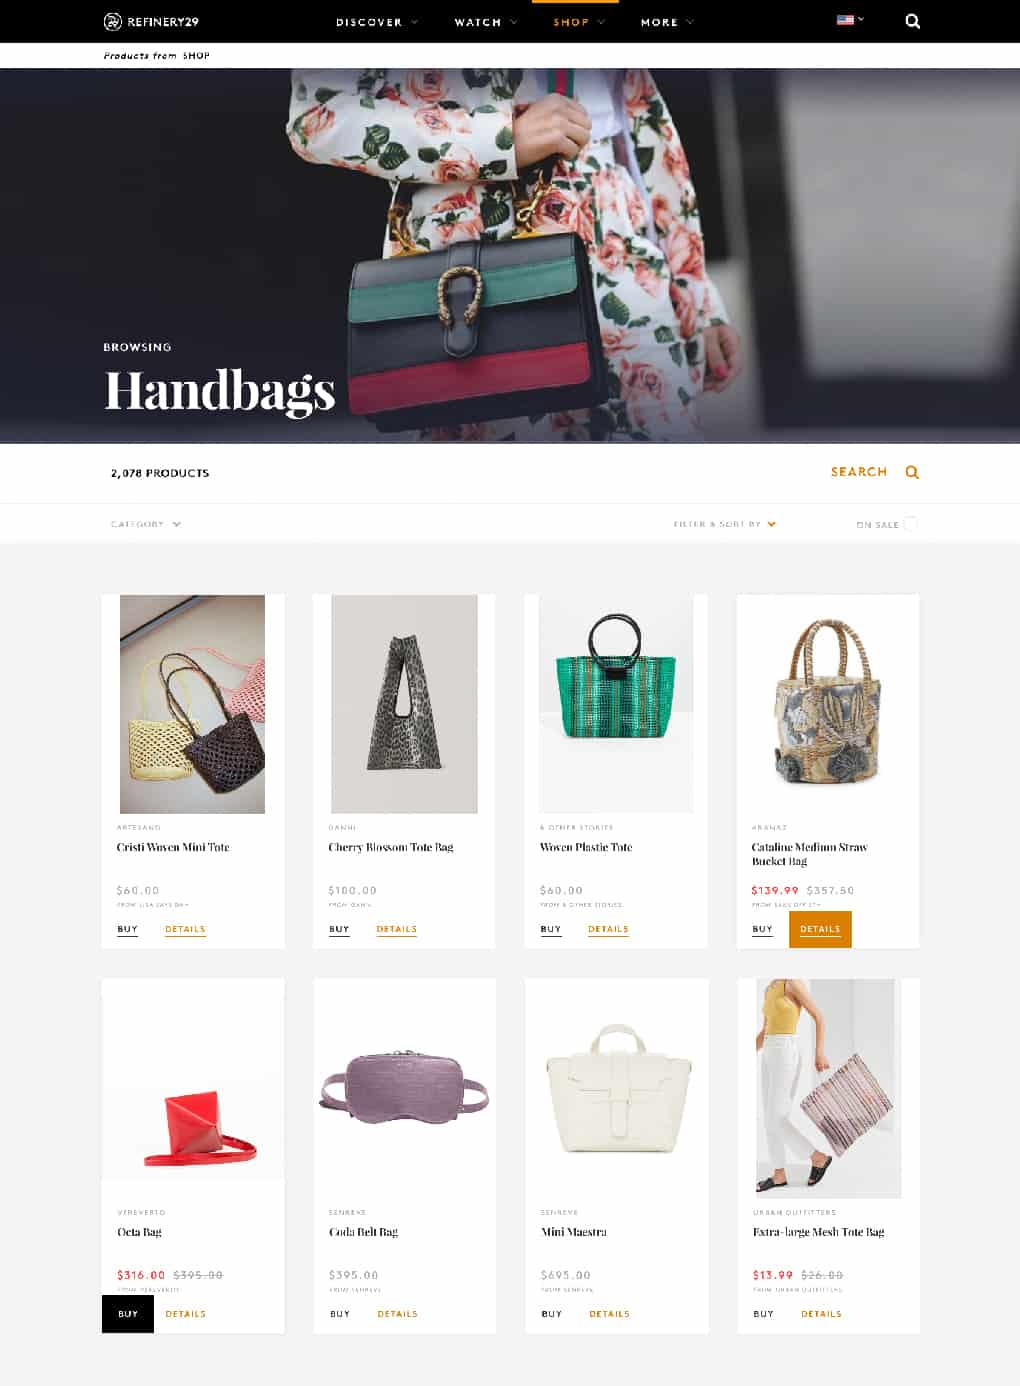 Handbags on Refinery 29